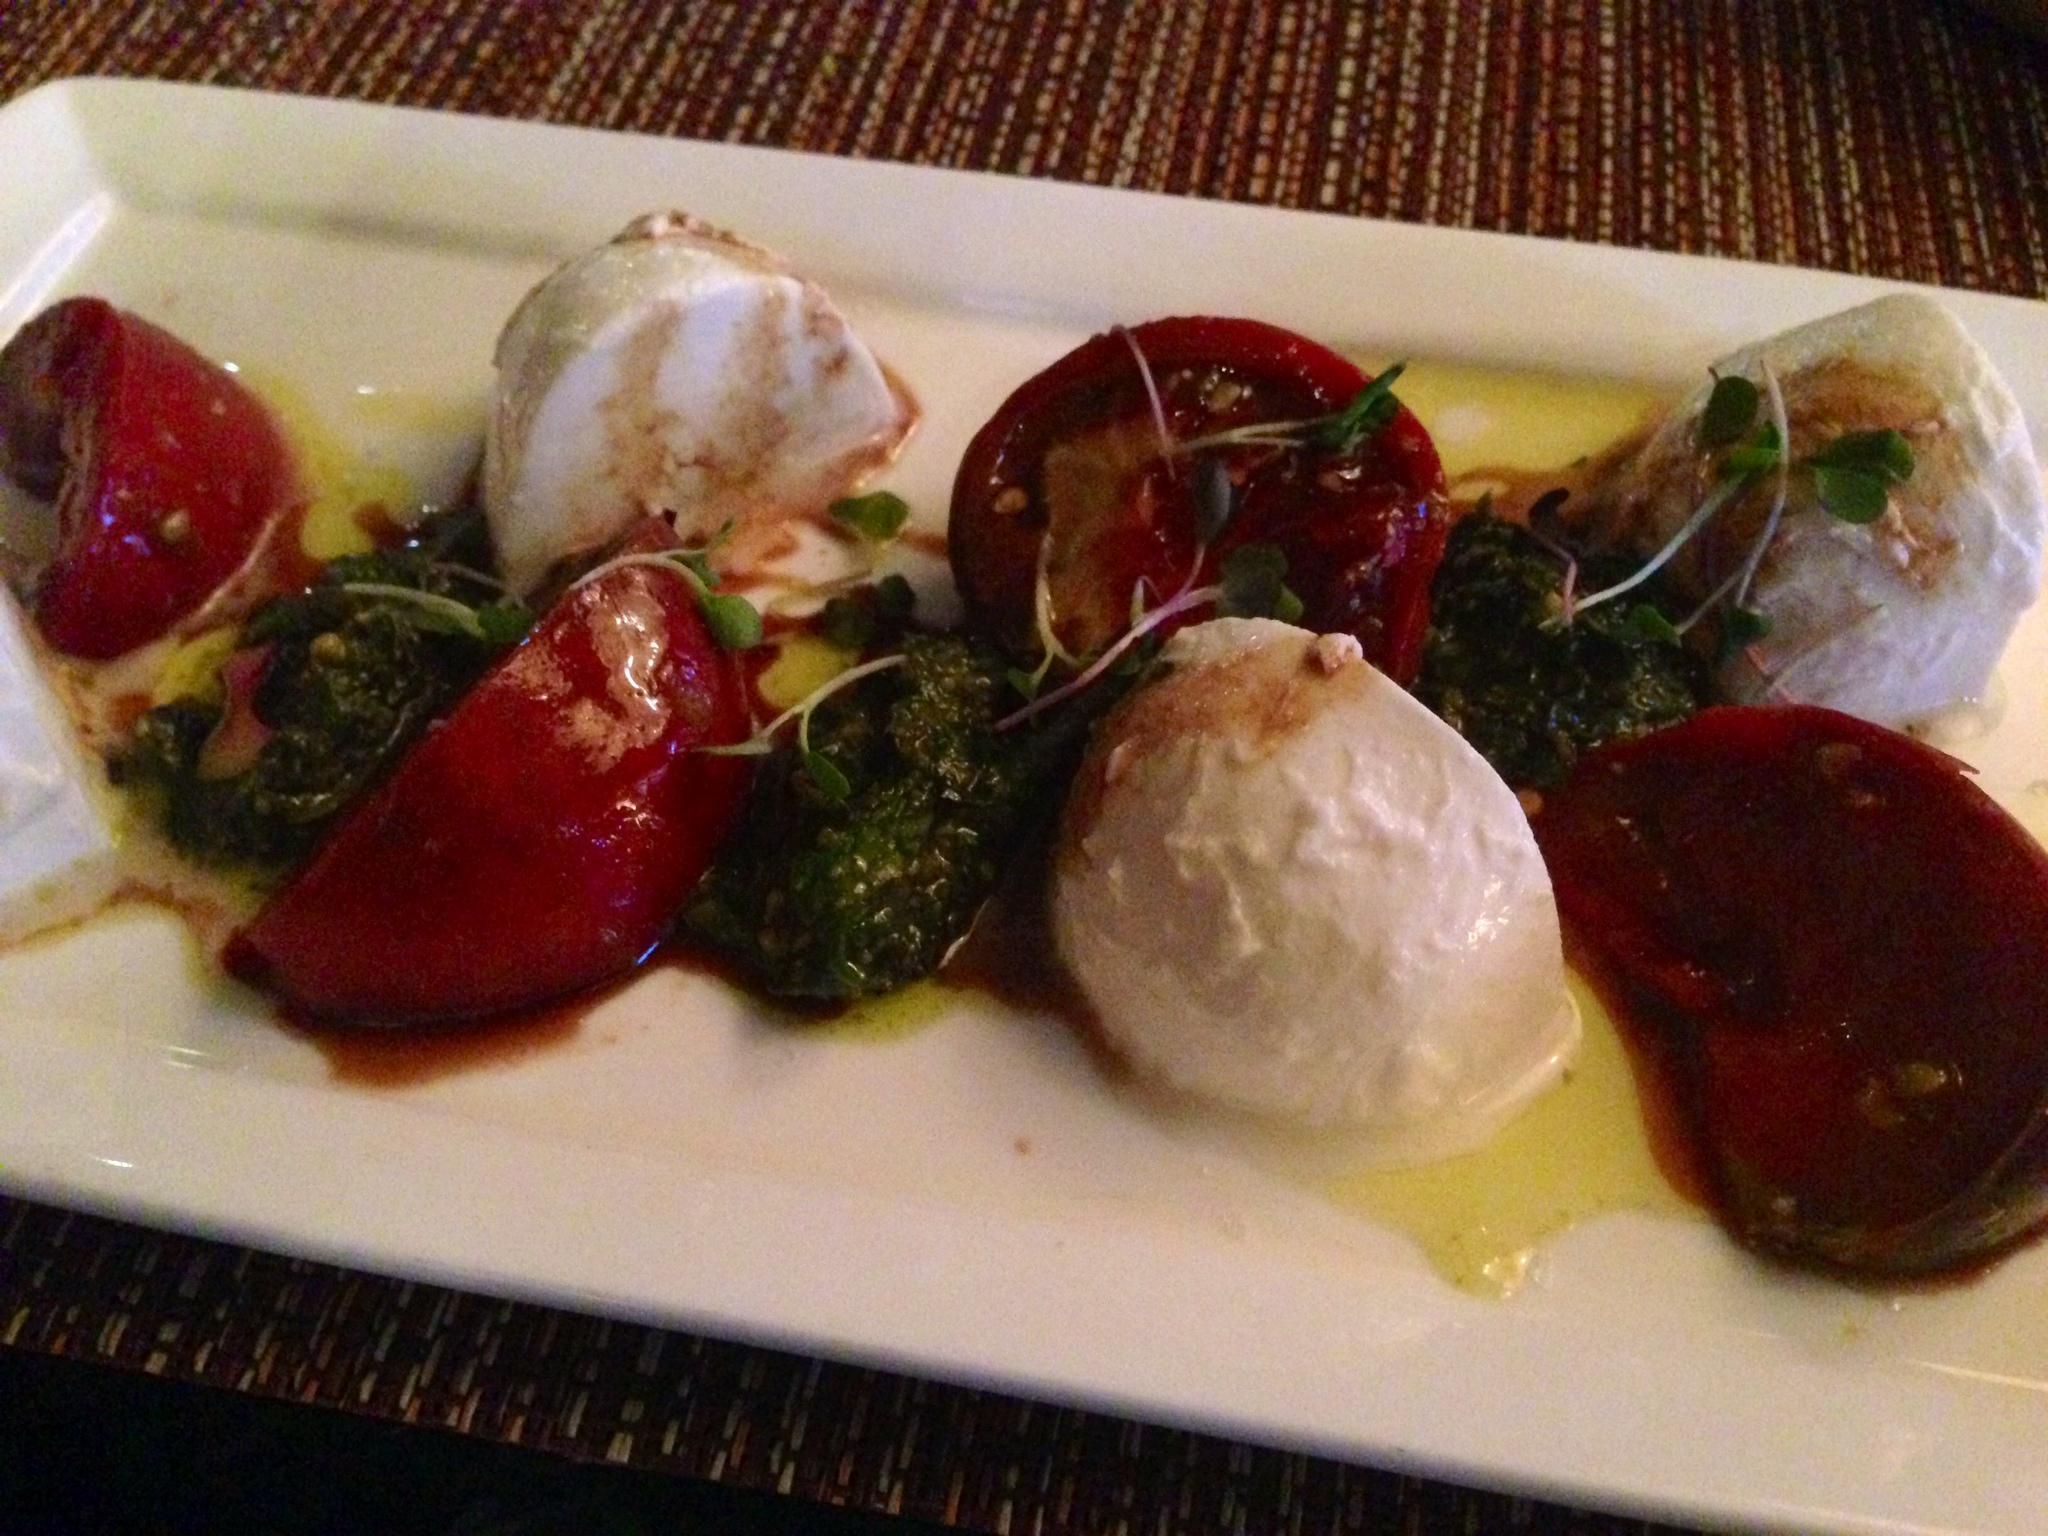 Heirloom Tomatoes & Mozzarella